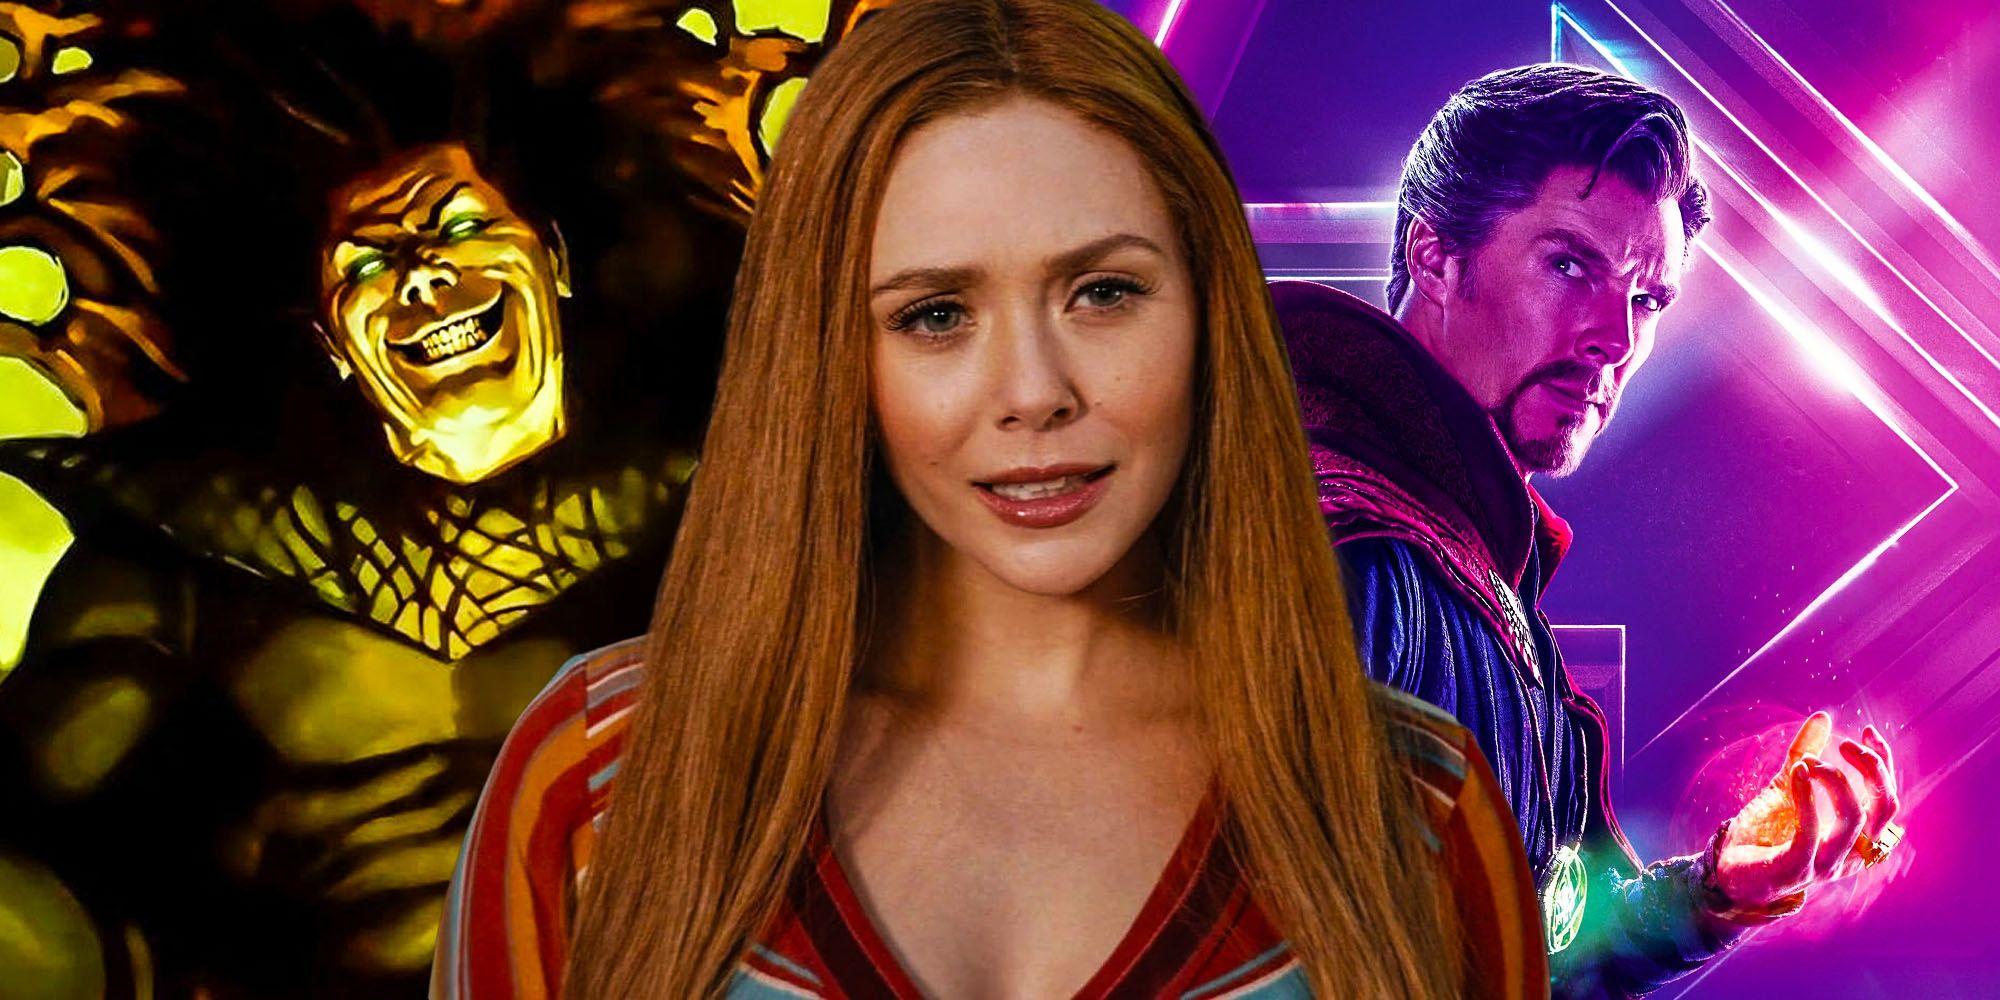 WandaVision Made Wanda Nightmare Before His Doctor Strange 2 Role